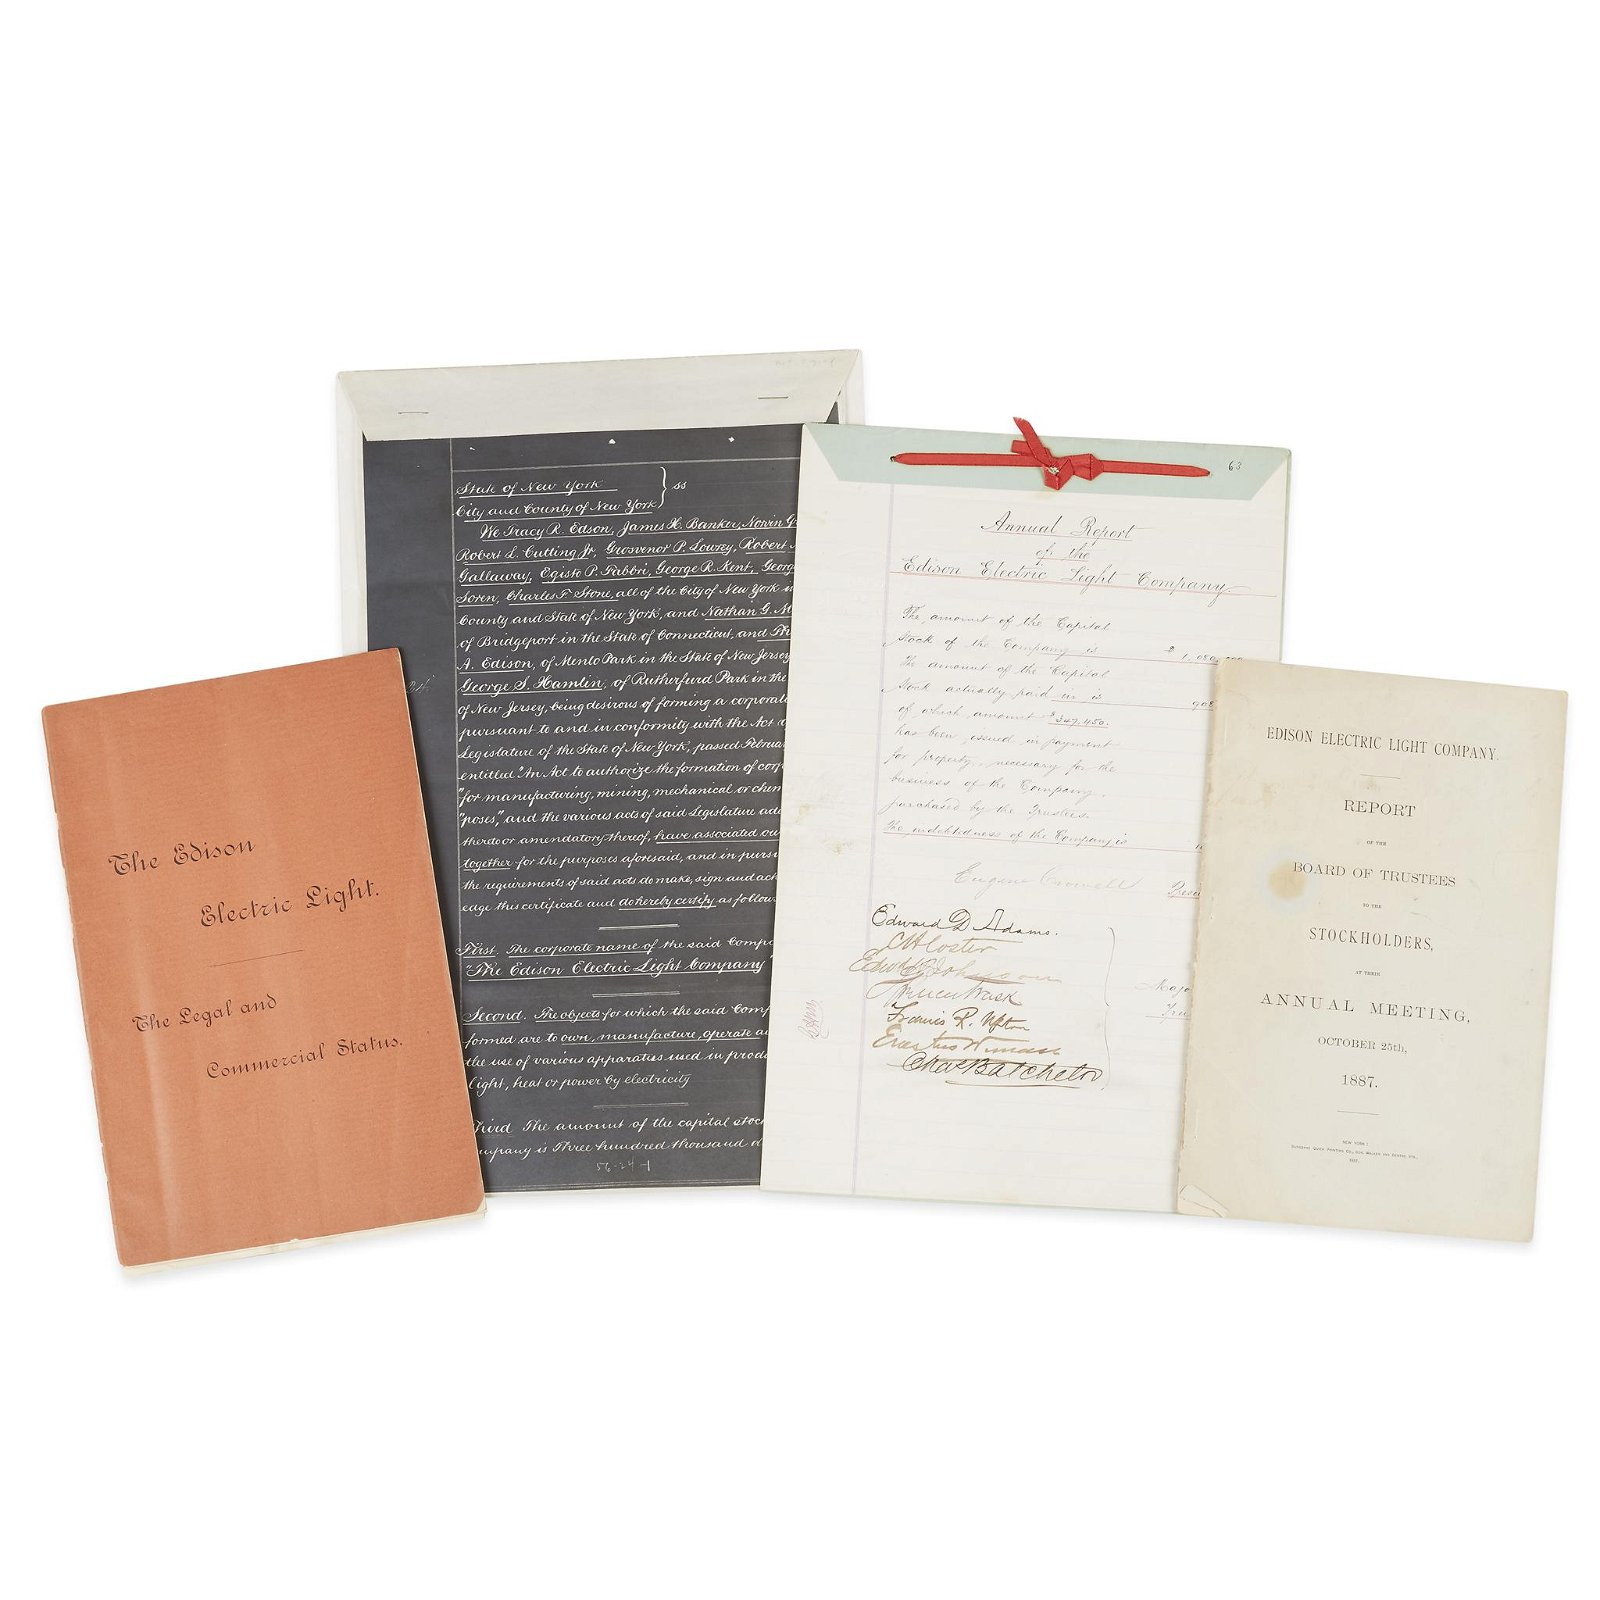 [Science, Medicine & Mathematics] [Edison, Thomas A.],